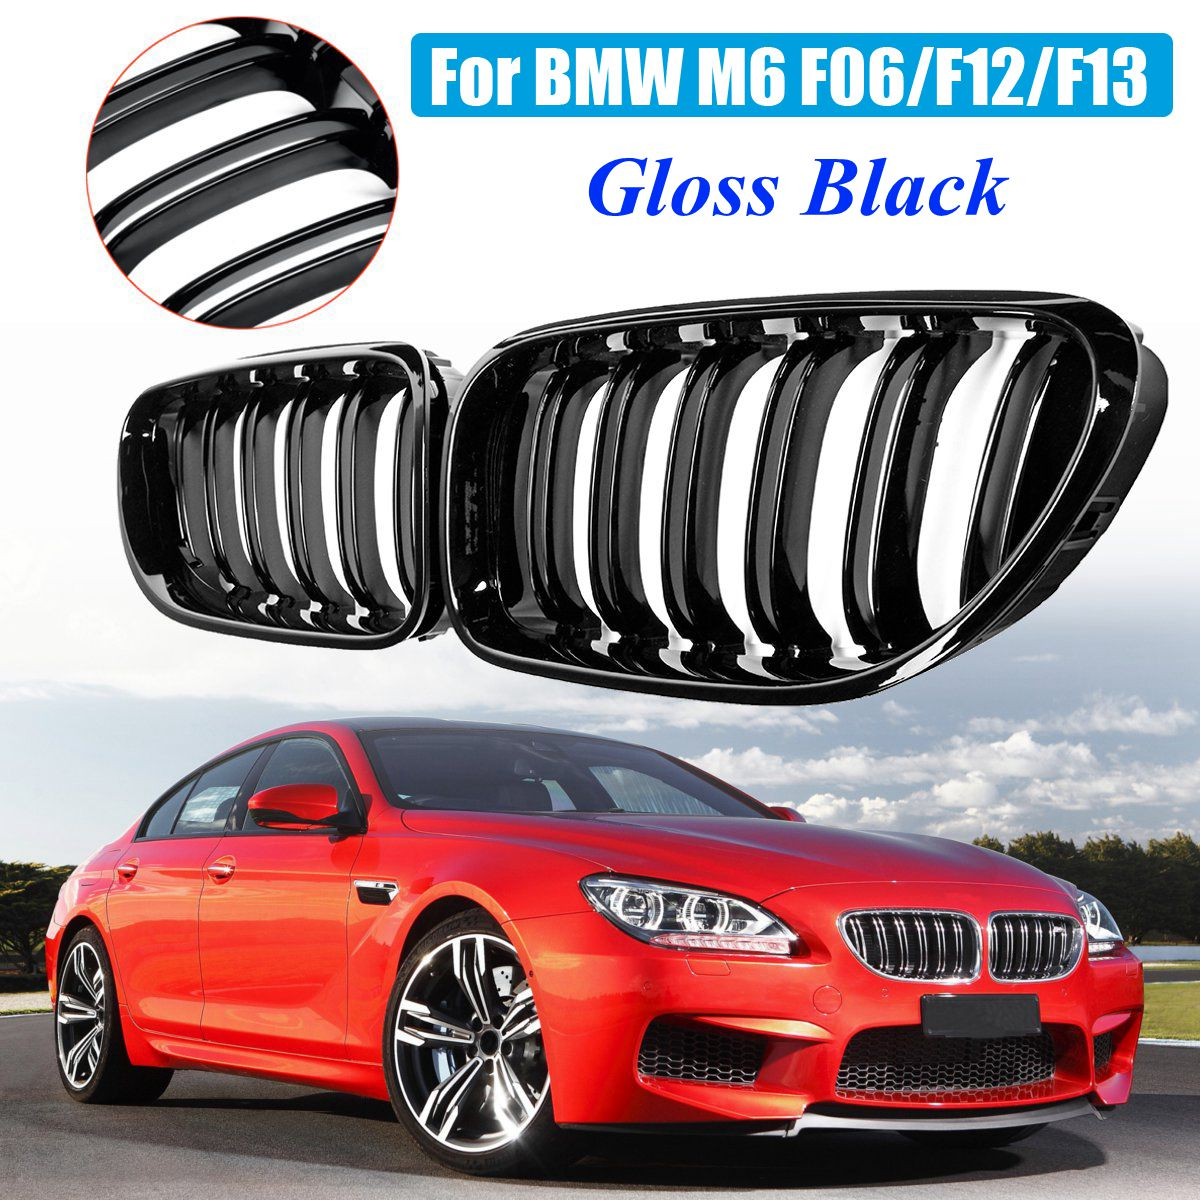 Car Front Kidney Grill Bumper Grill Double Slat Line Gloss Black For BMW M6 640i 650i F06 F12 F13 2012 2013 2014 2015 2016 2017